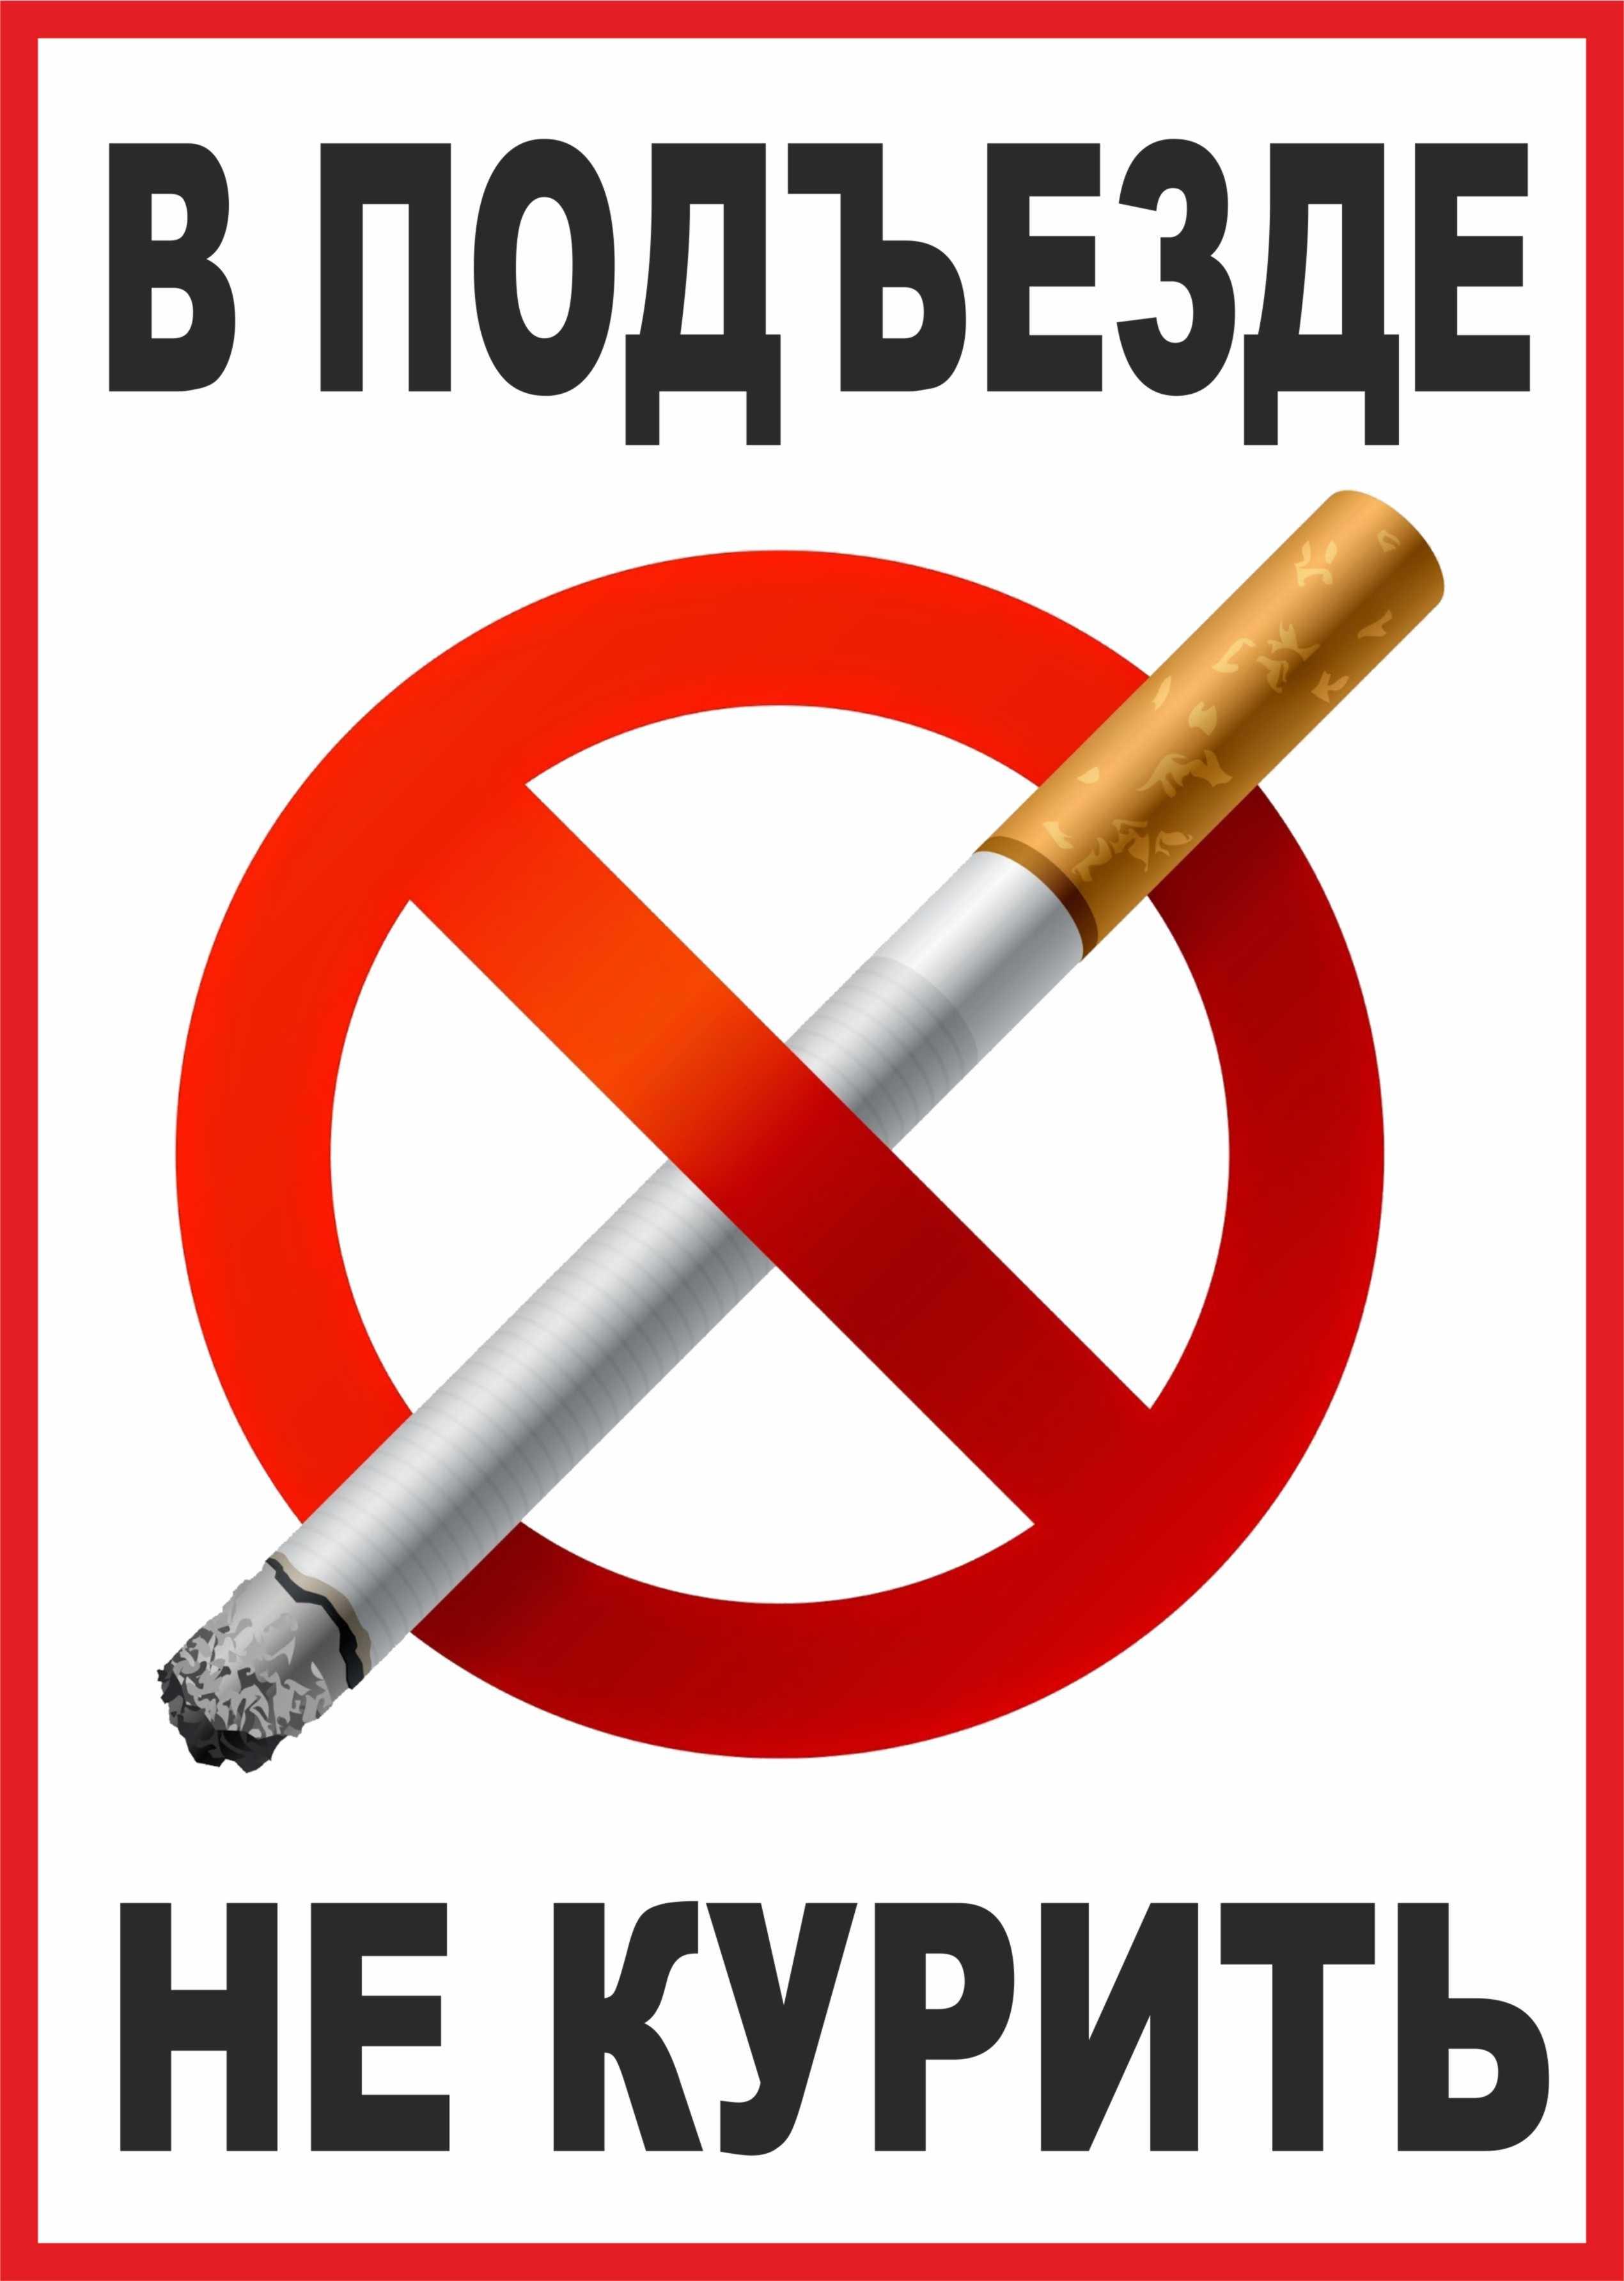 Картинки против курения с надписями в подъезде, открытка свата днем